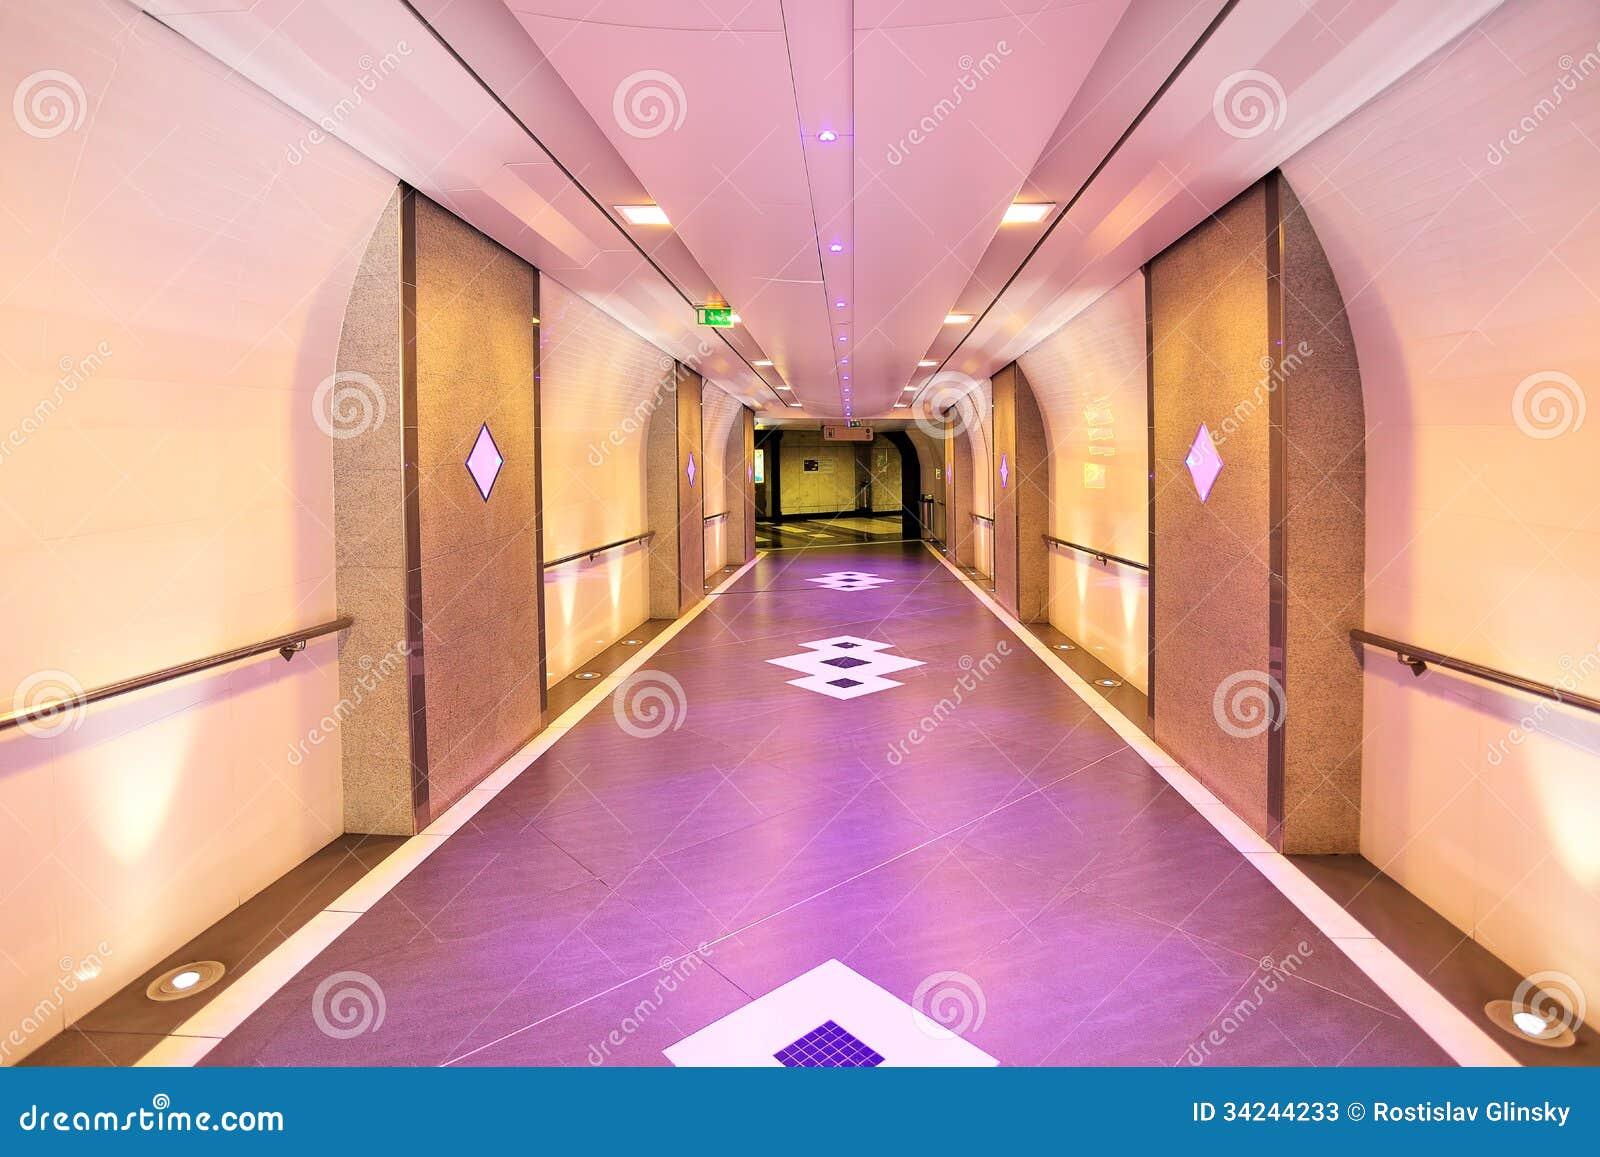 Underground Passage In Monte Carlo, Monaco. Stock Image - Image ...